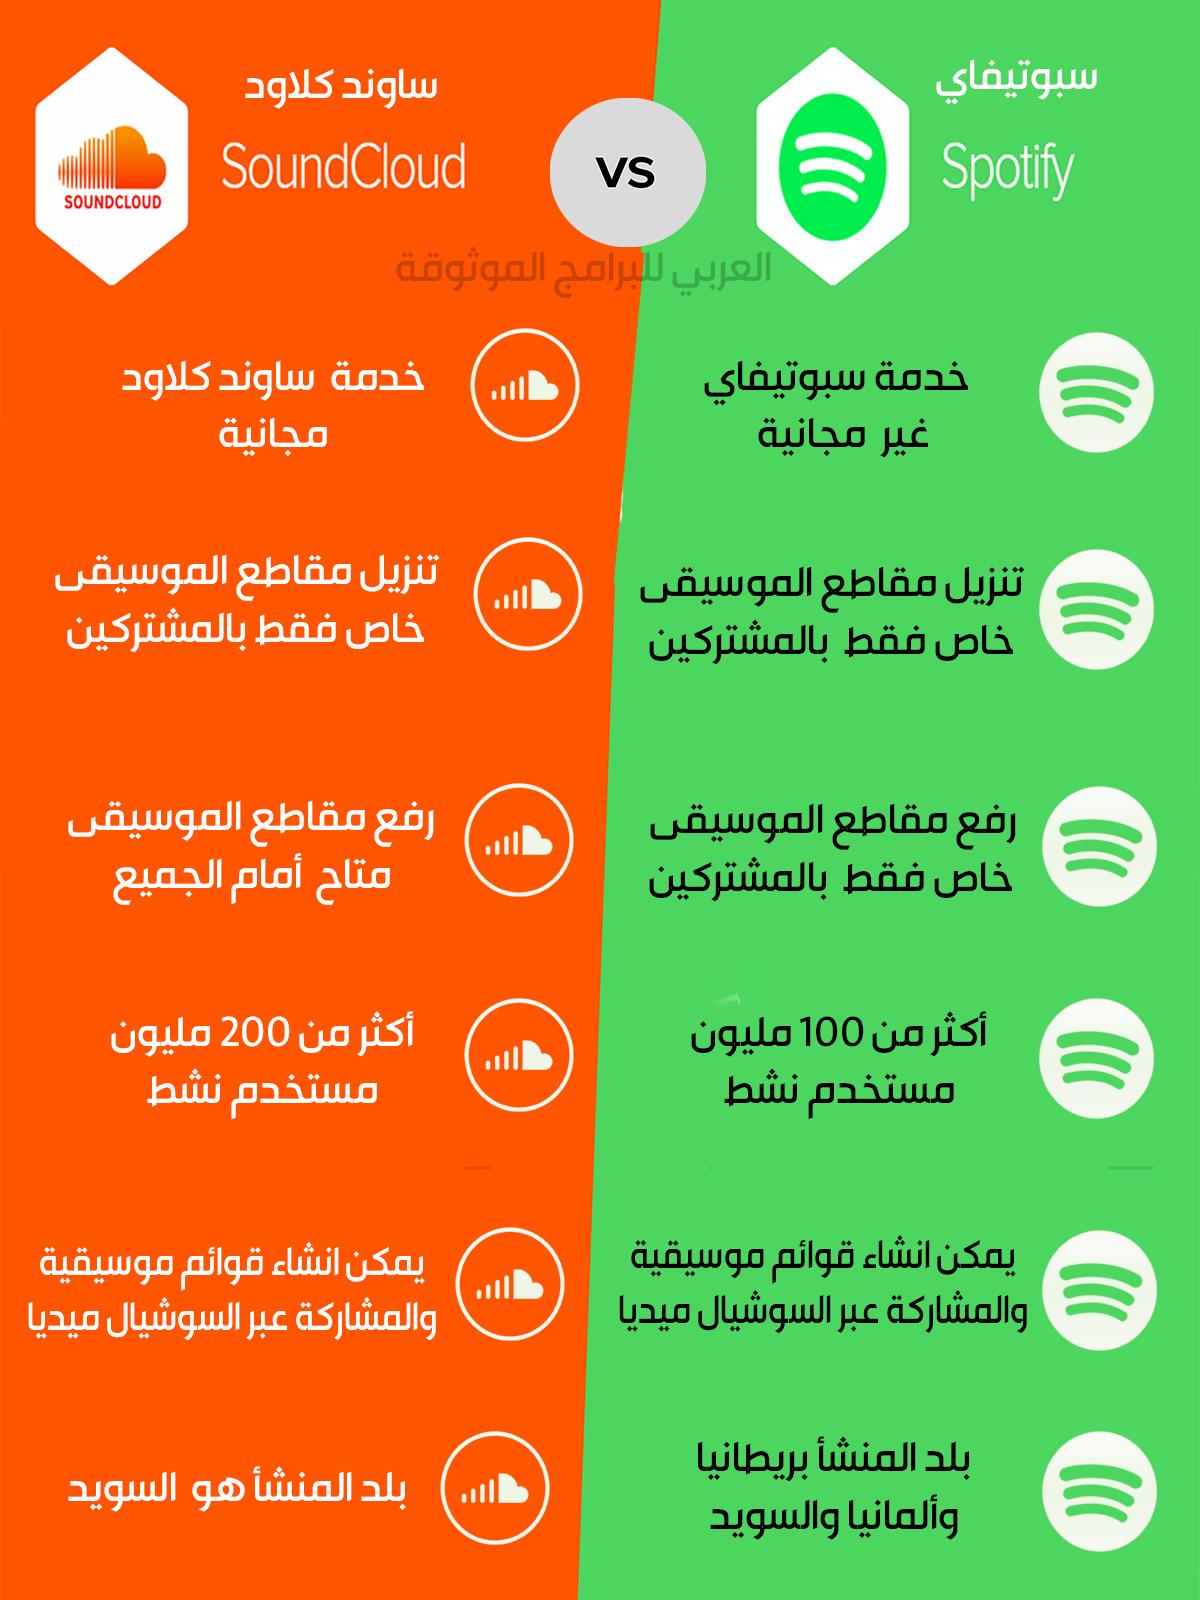 مقارنة بين تطبيق سبوتيفاي وبرنامج ساوندكلاود Sound Cloud vs Spotify